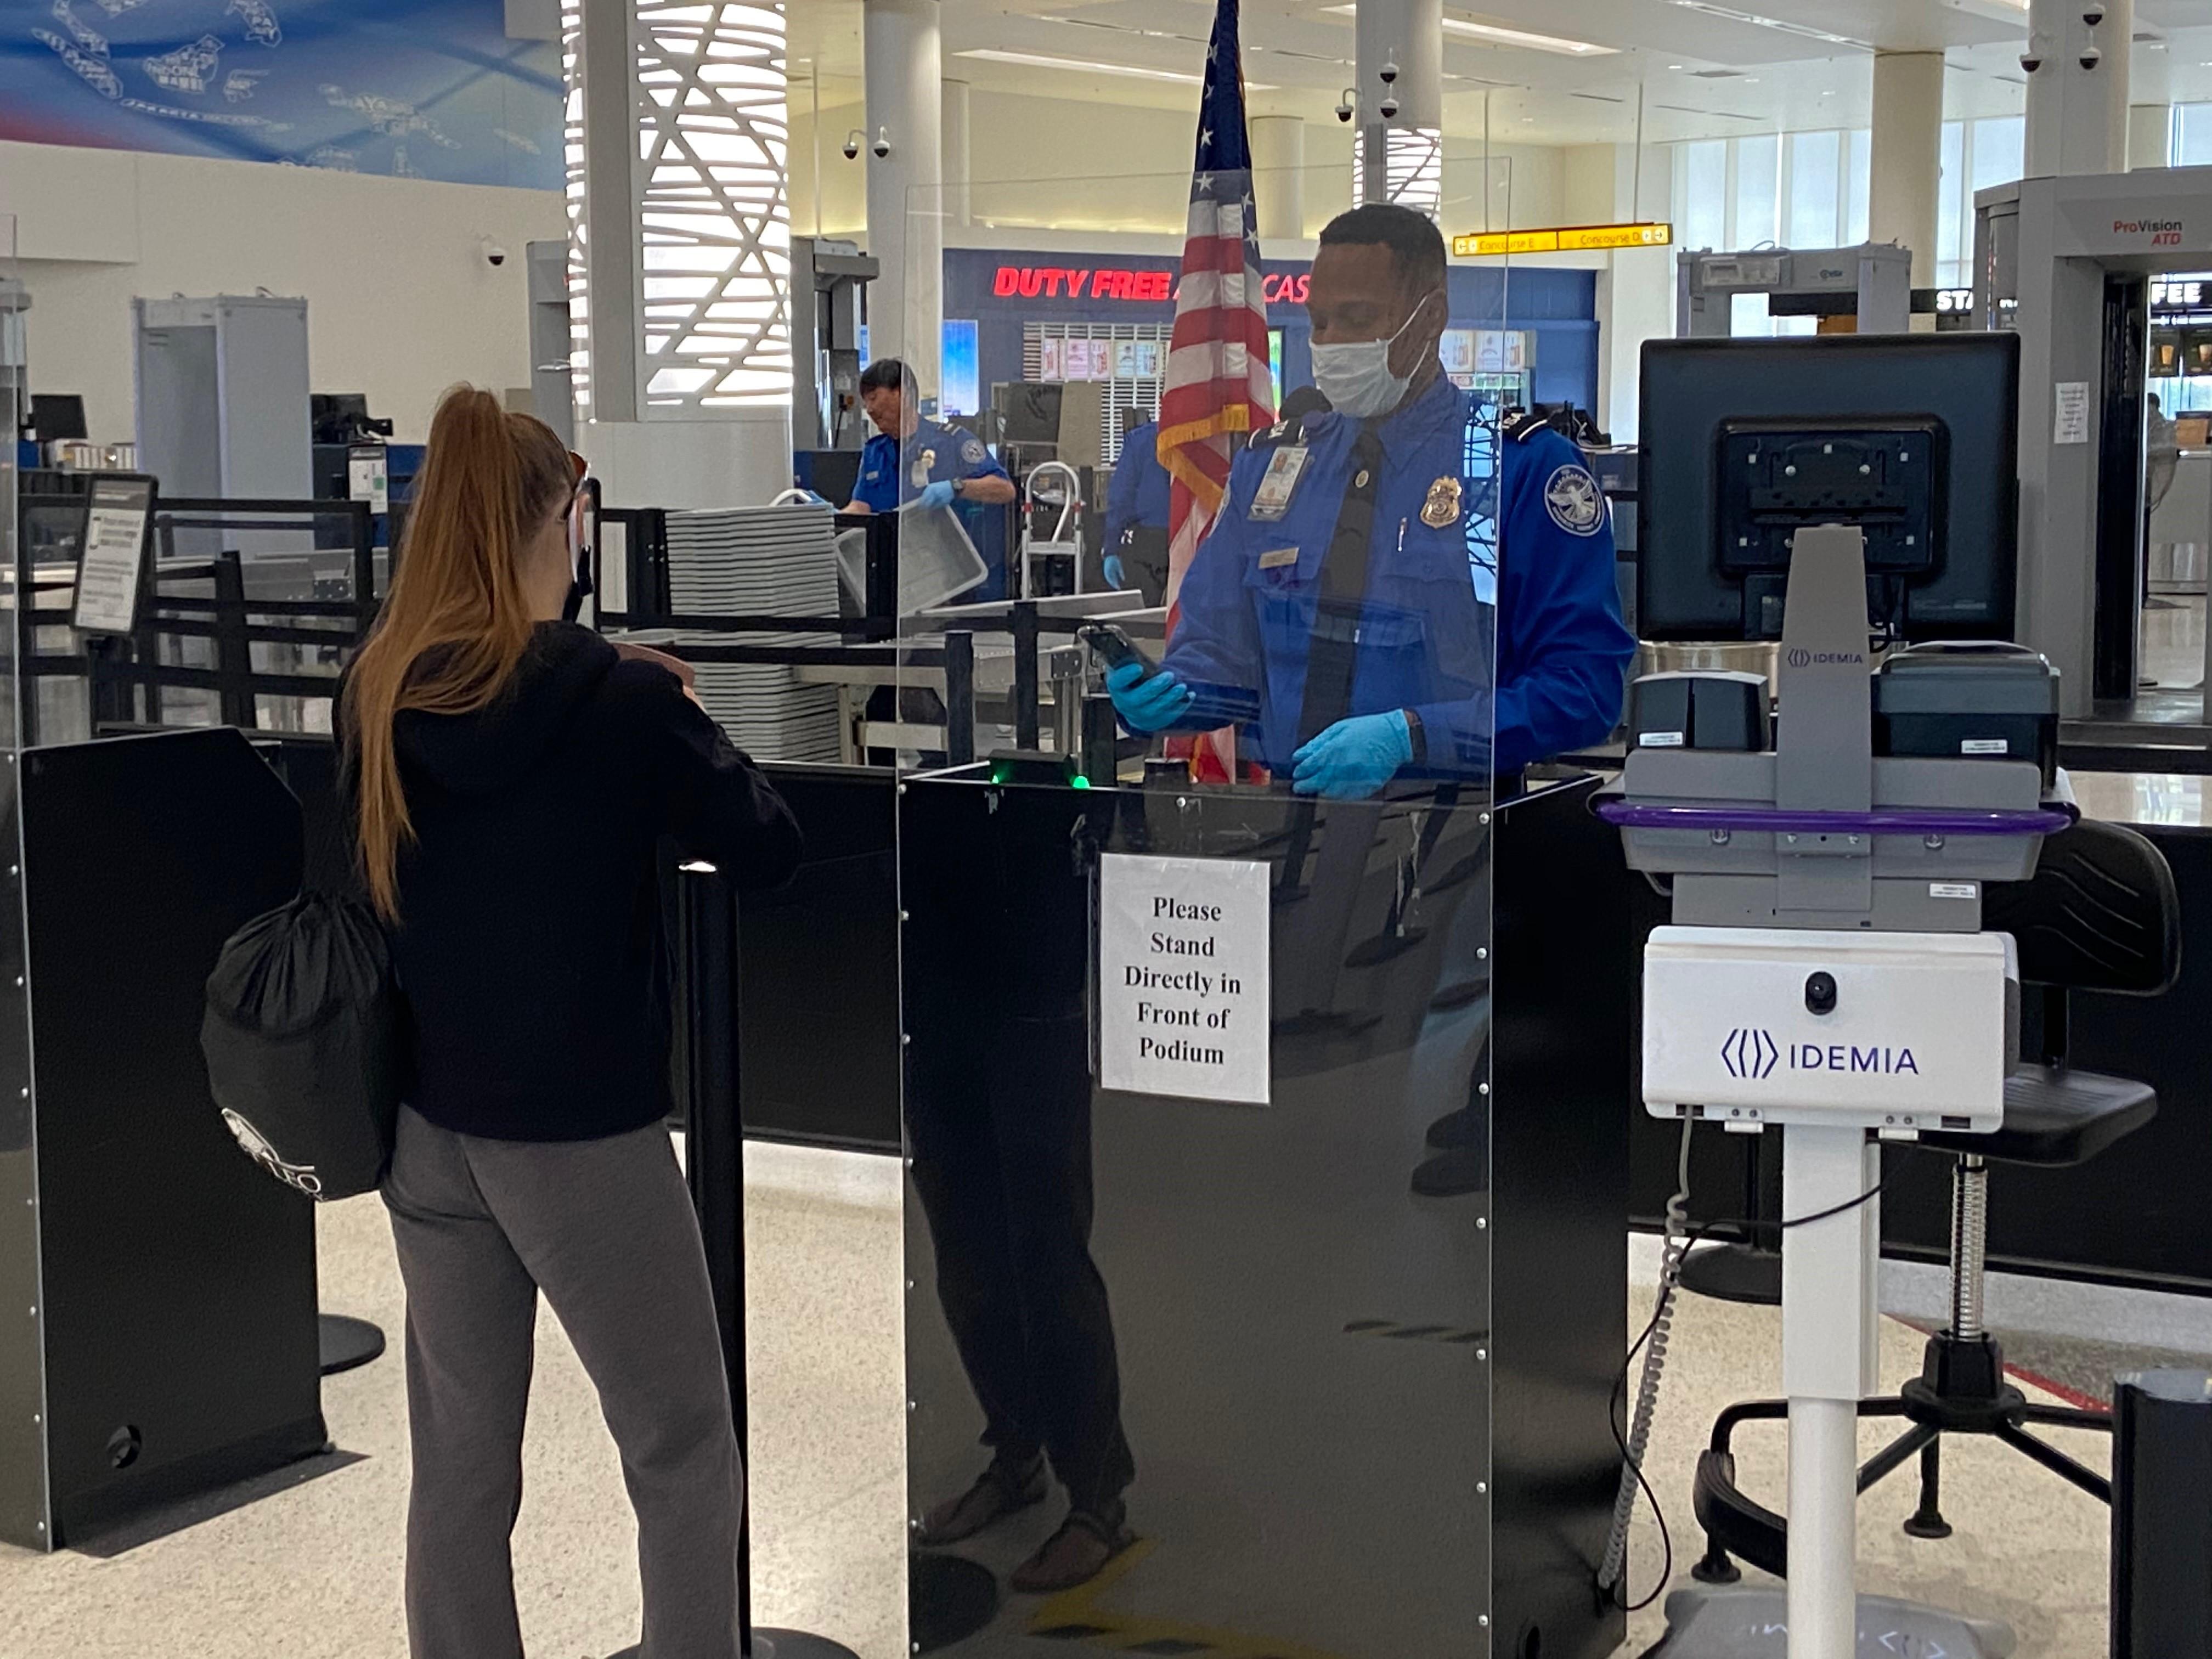 非 Real ID 的驾照2021年10月起不可登机